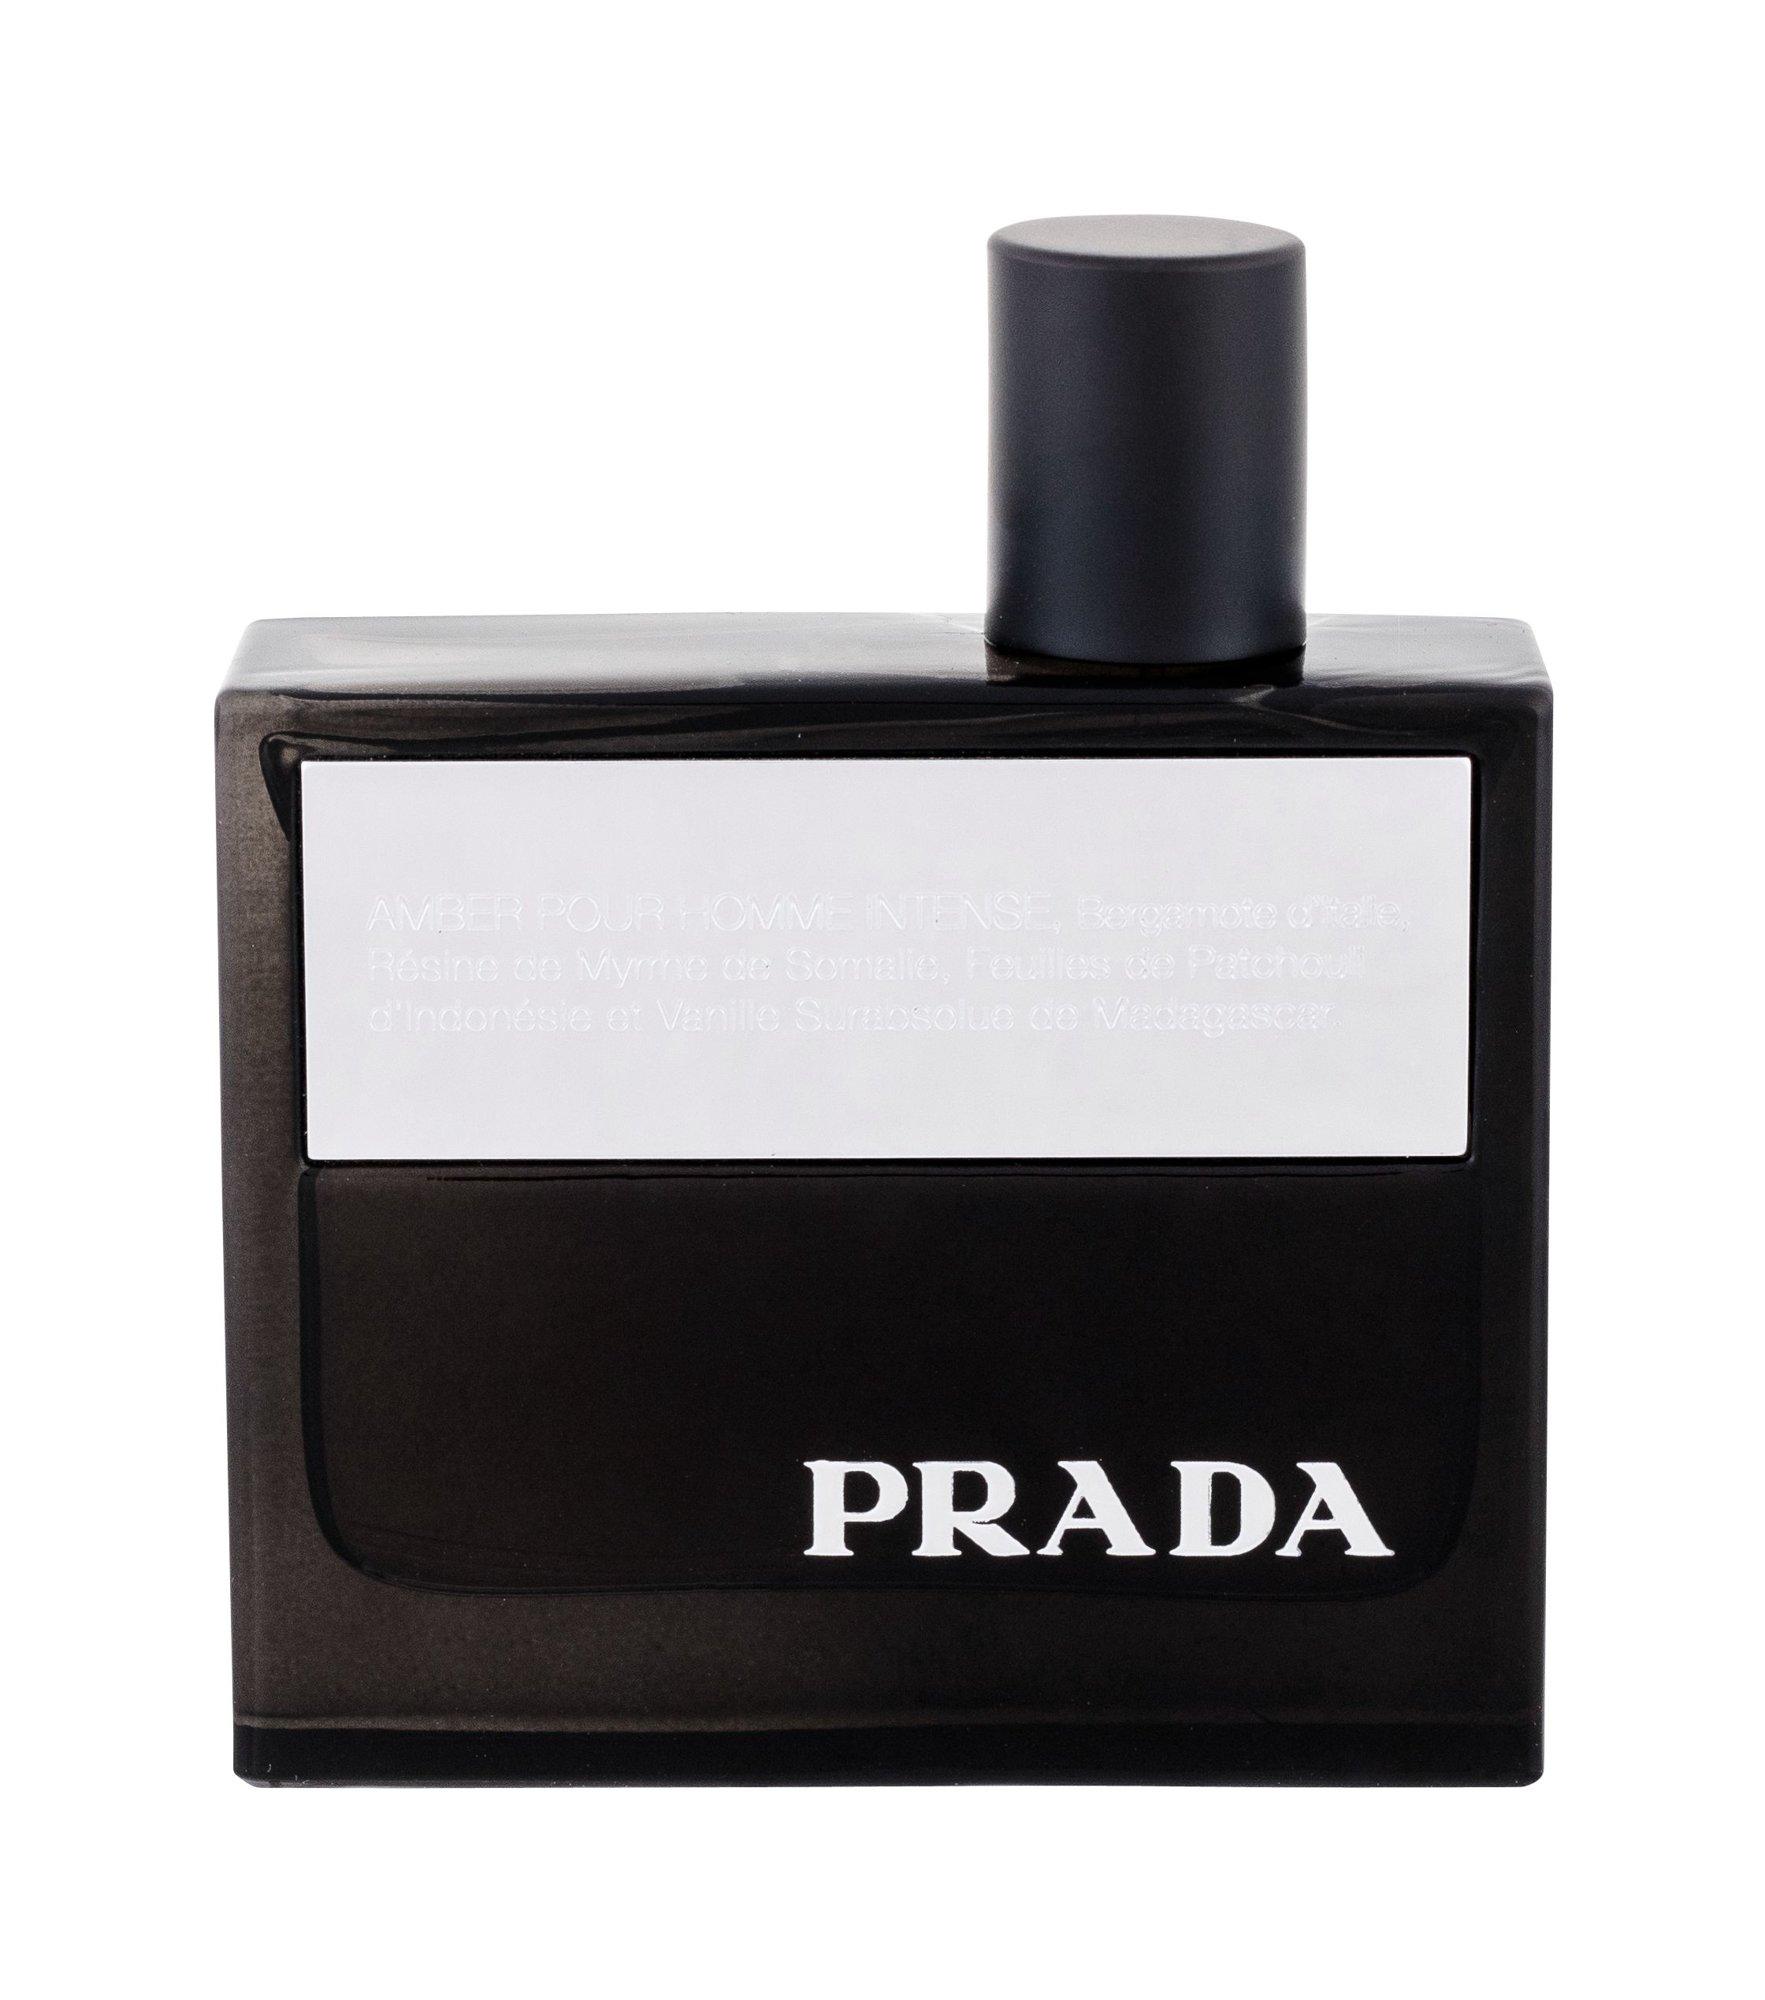 Prada Prada Amber Pour Homme Intense, Parfumovaná voda 50ml